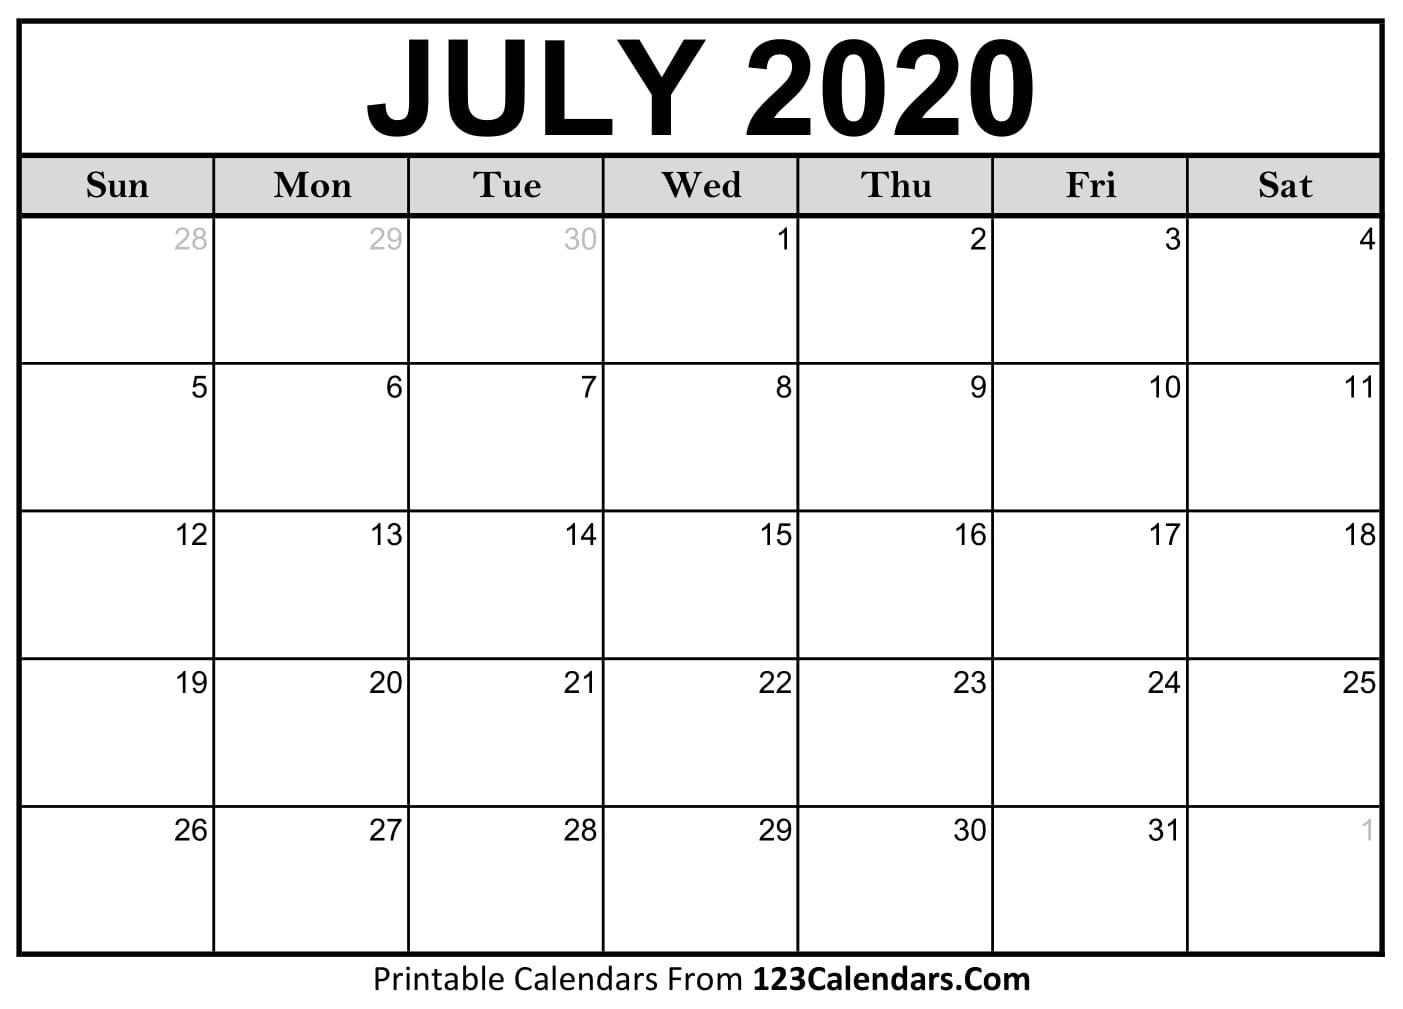 July 2020 Printable Calendar | 123Calendars-June August 2020 Calendar Template